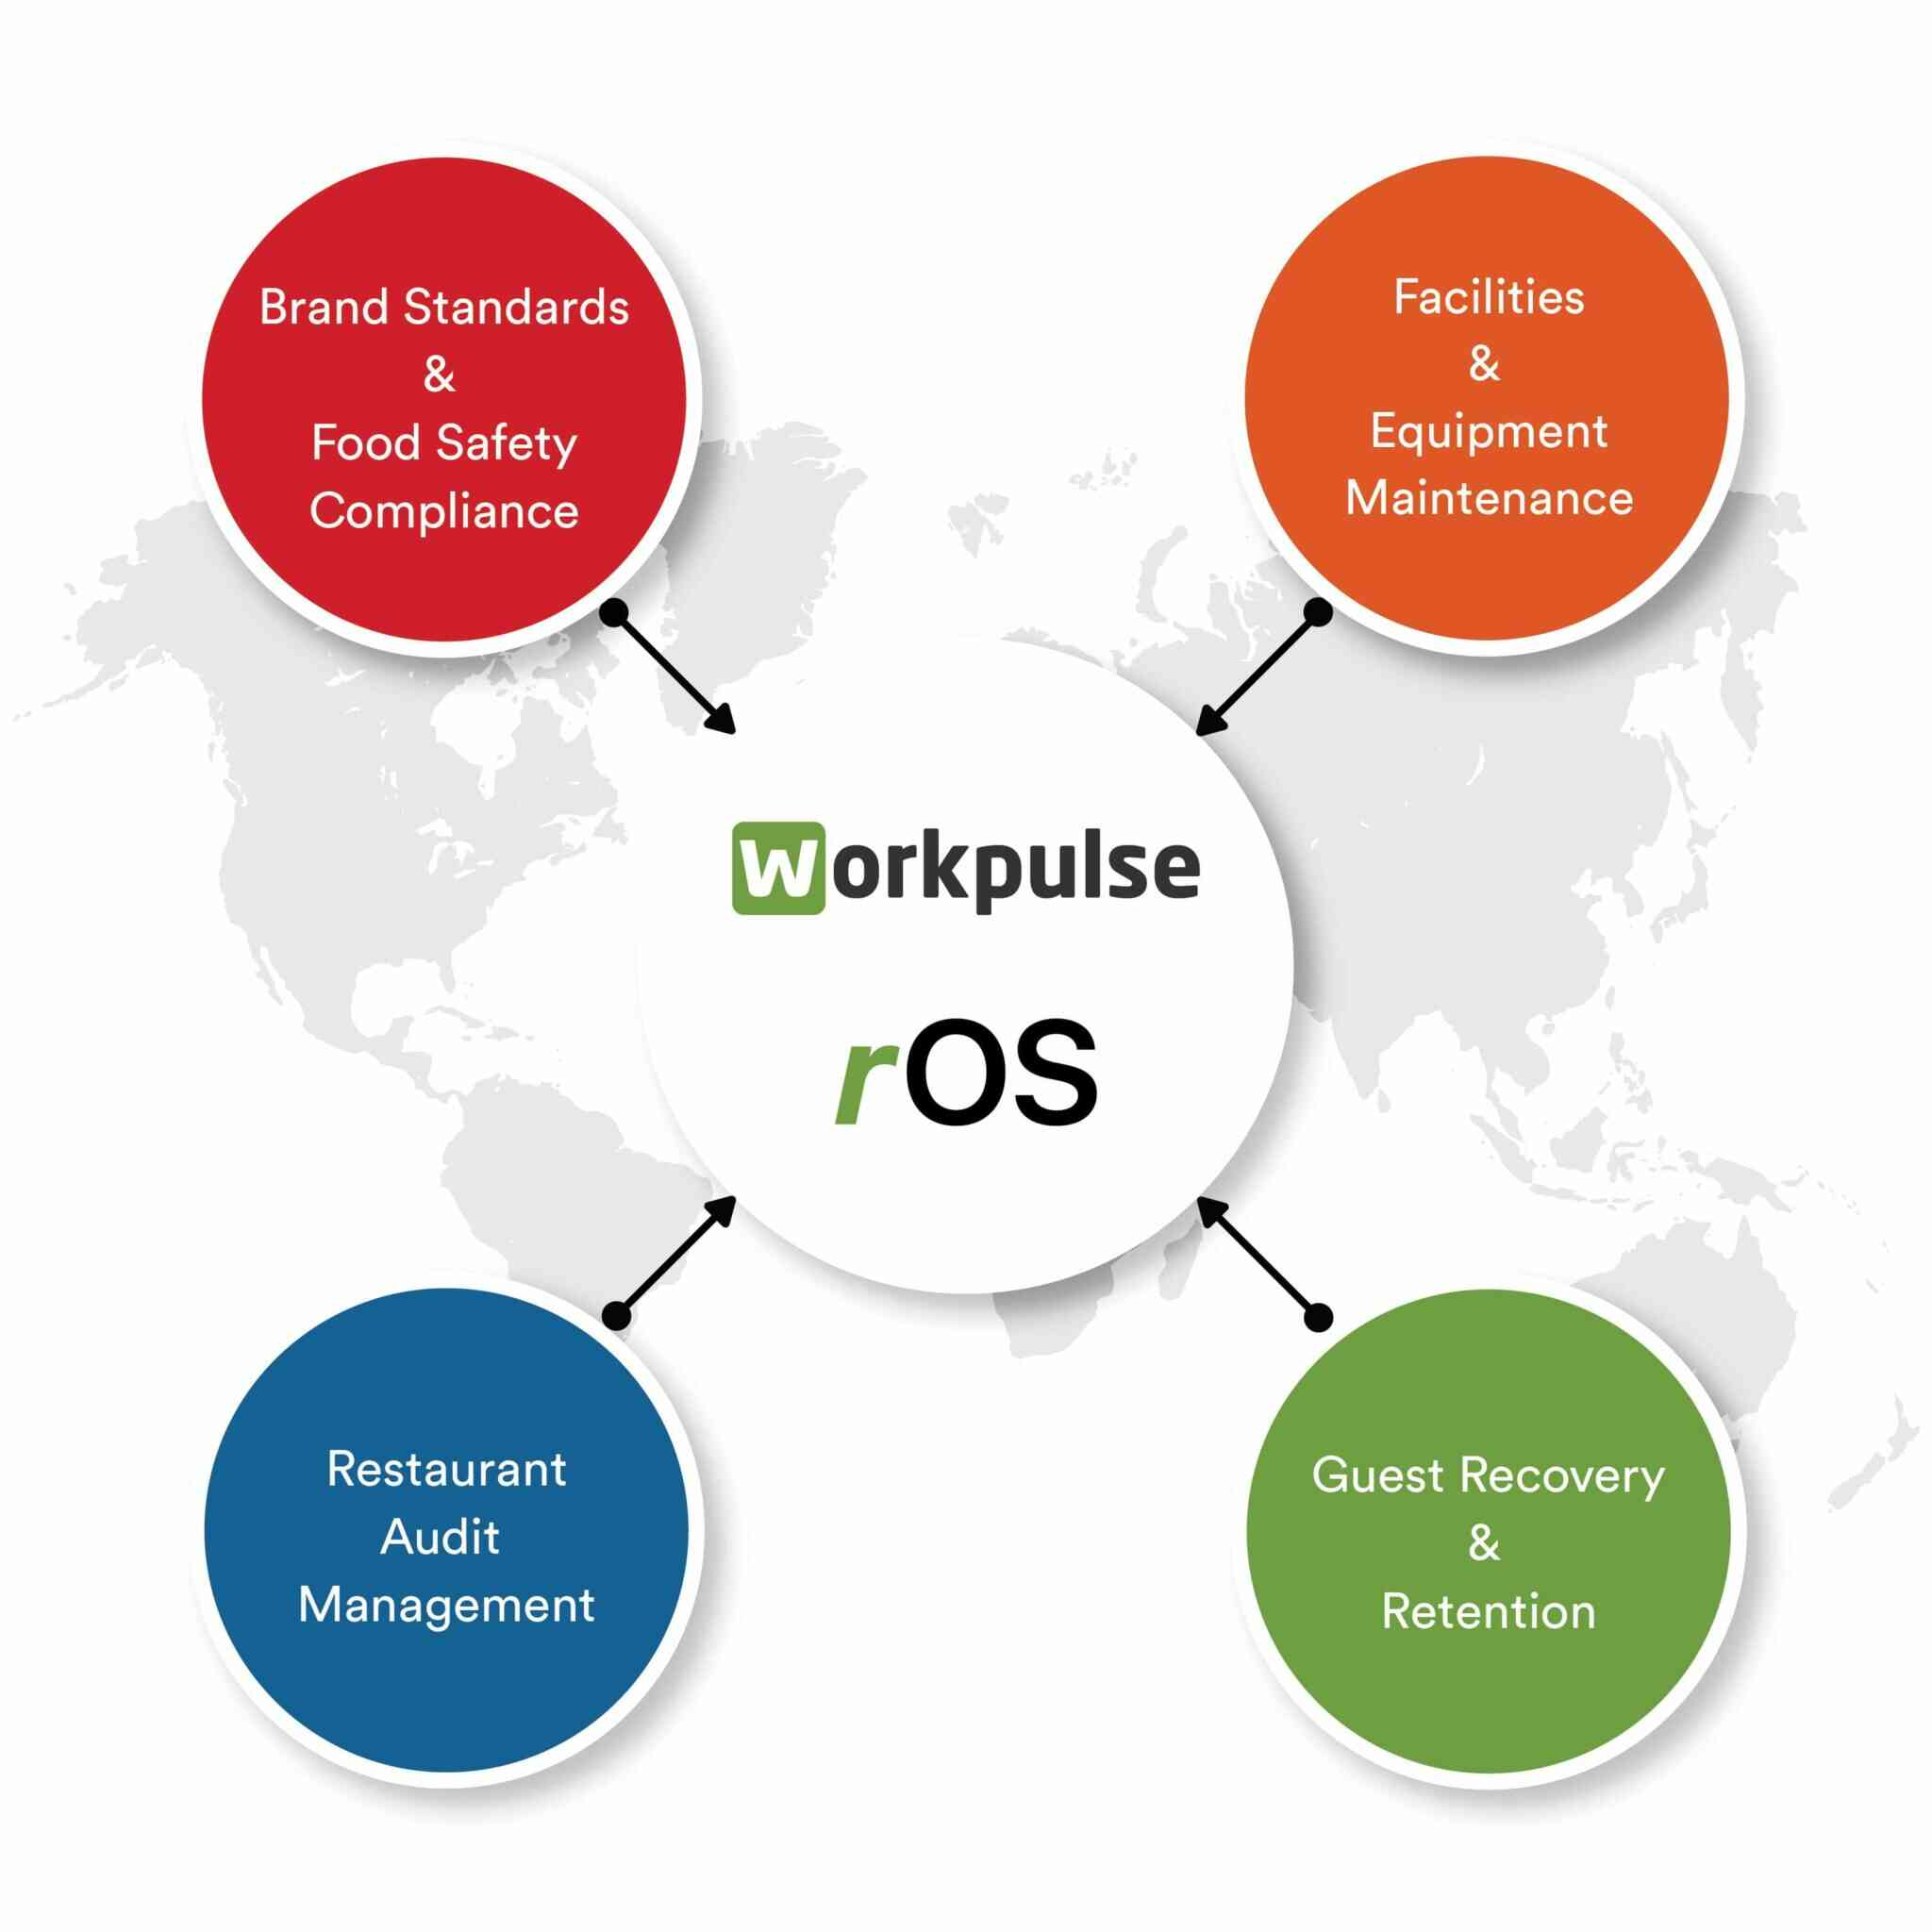 https://www.workpulse.com/wp-content/uploads/2021/07/Restaurant-Operating-System.jpg